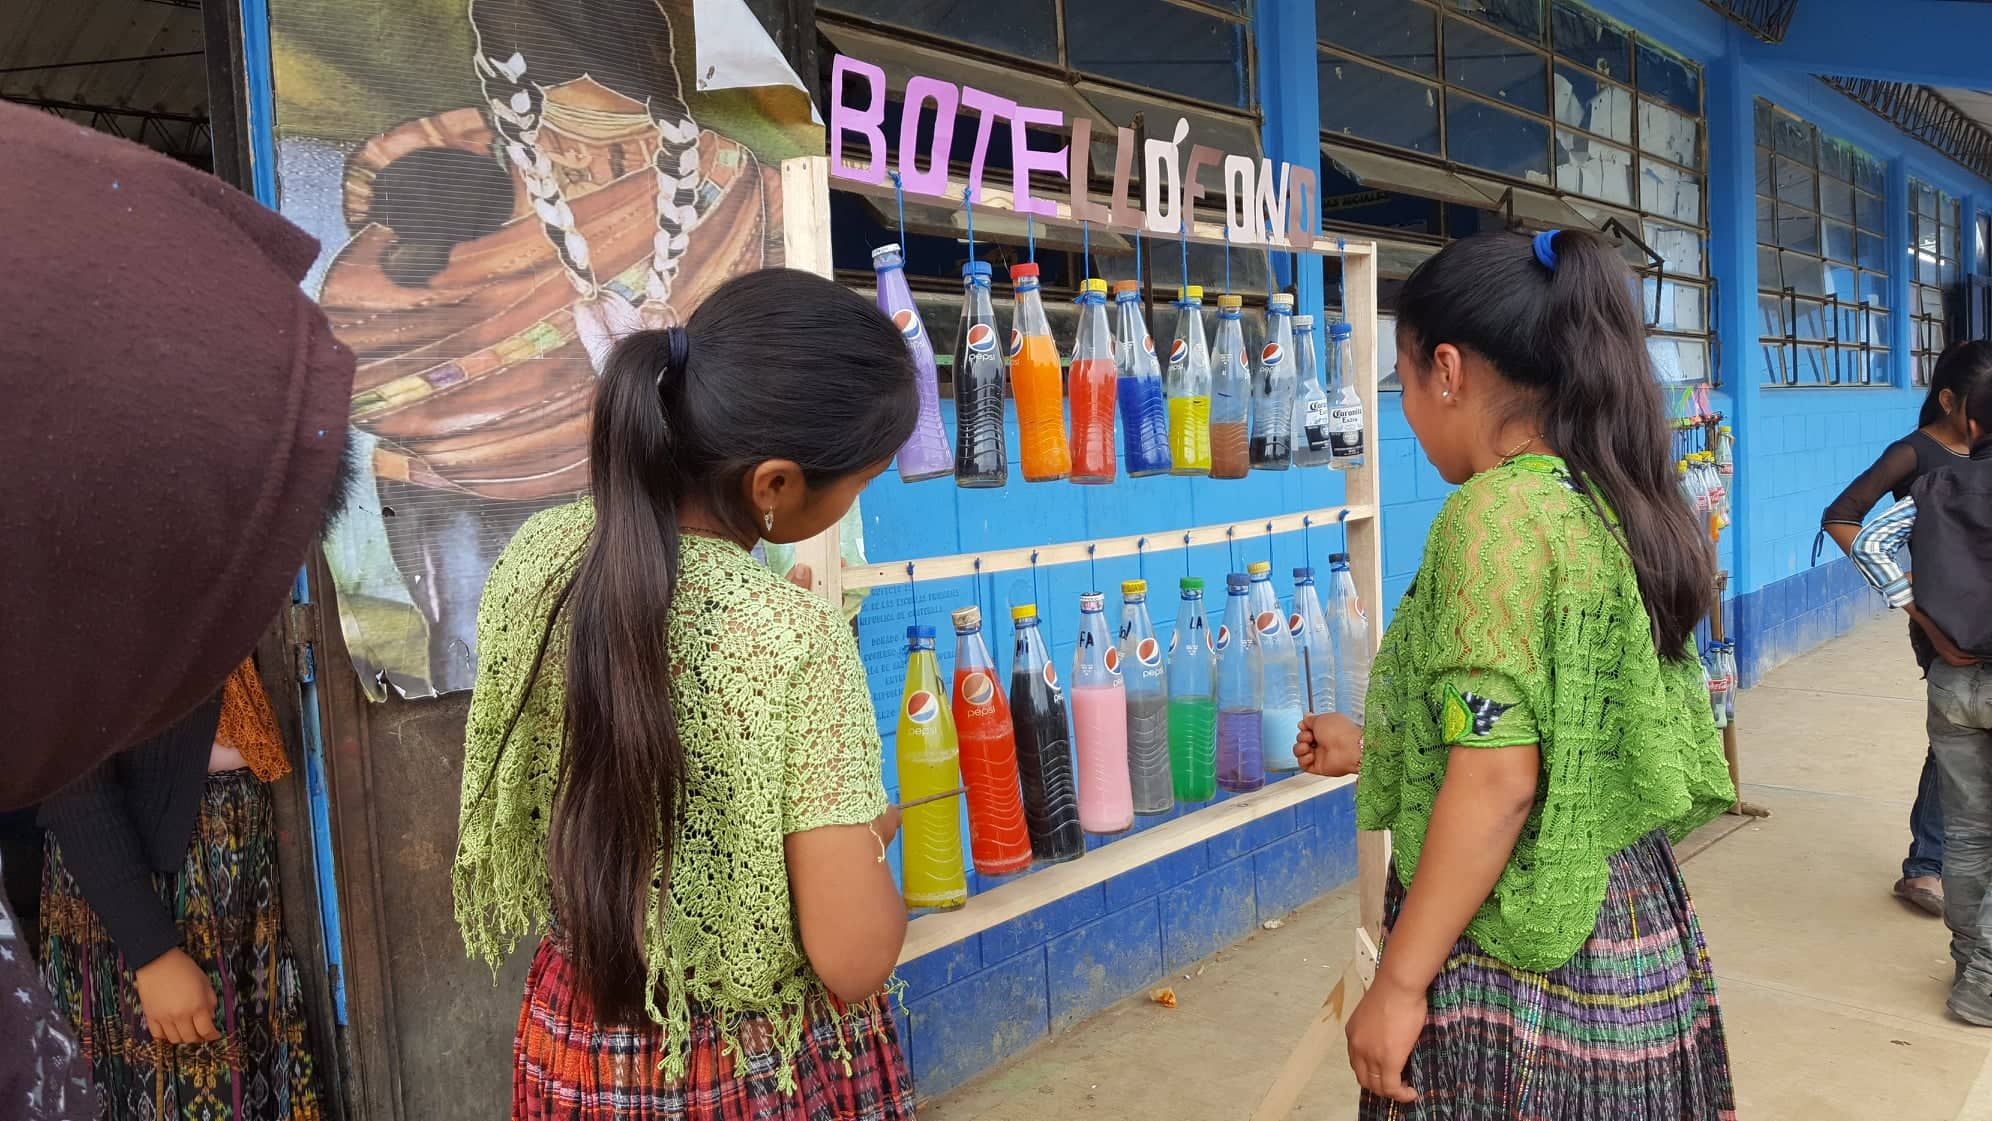 El instrumento musical botellófono, está fabricado de botellas. (Foto Prensa Libre: Eduardo Sam)